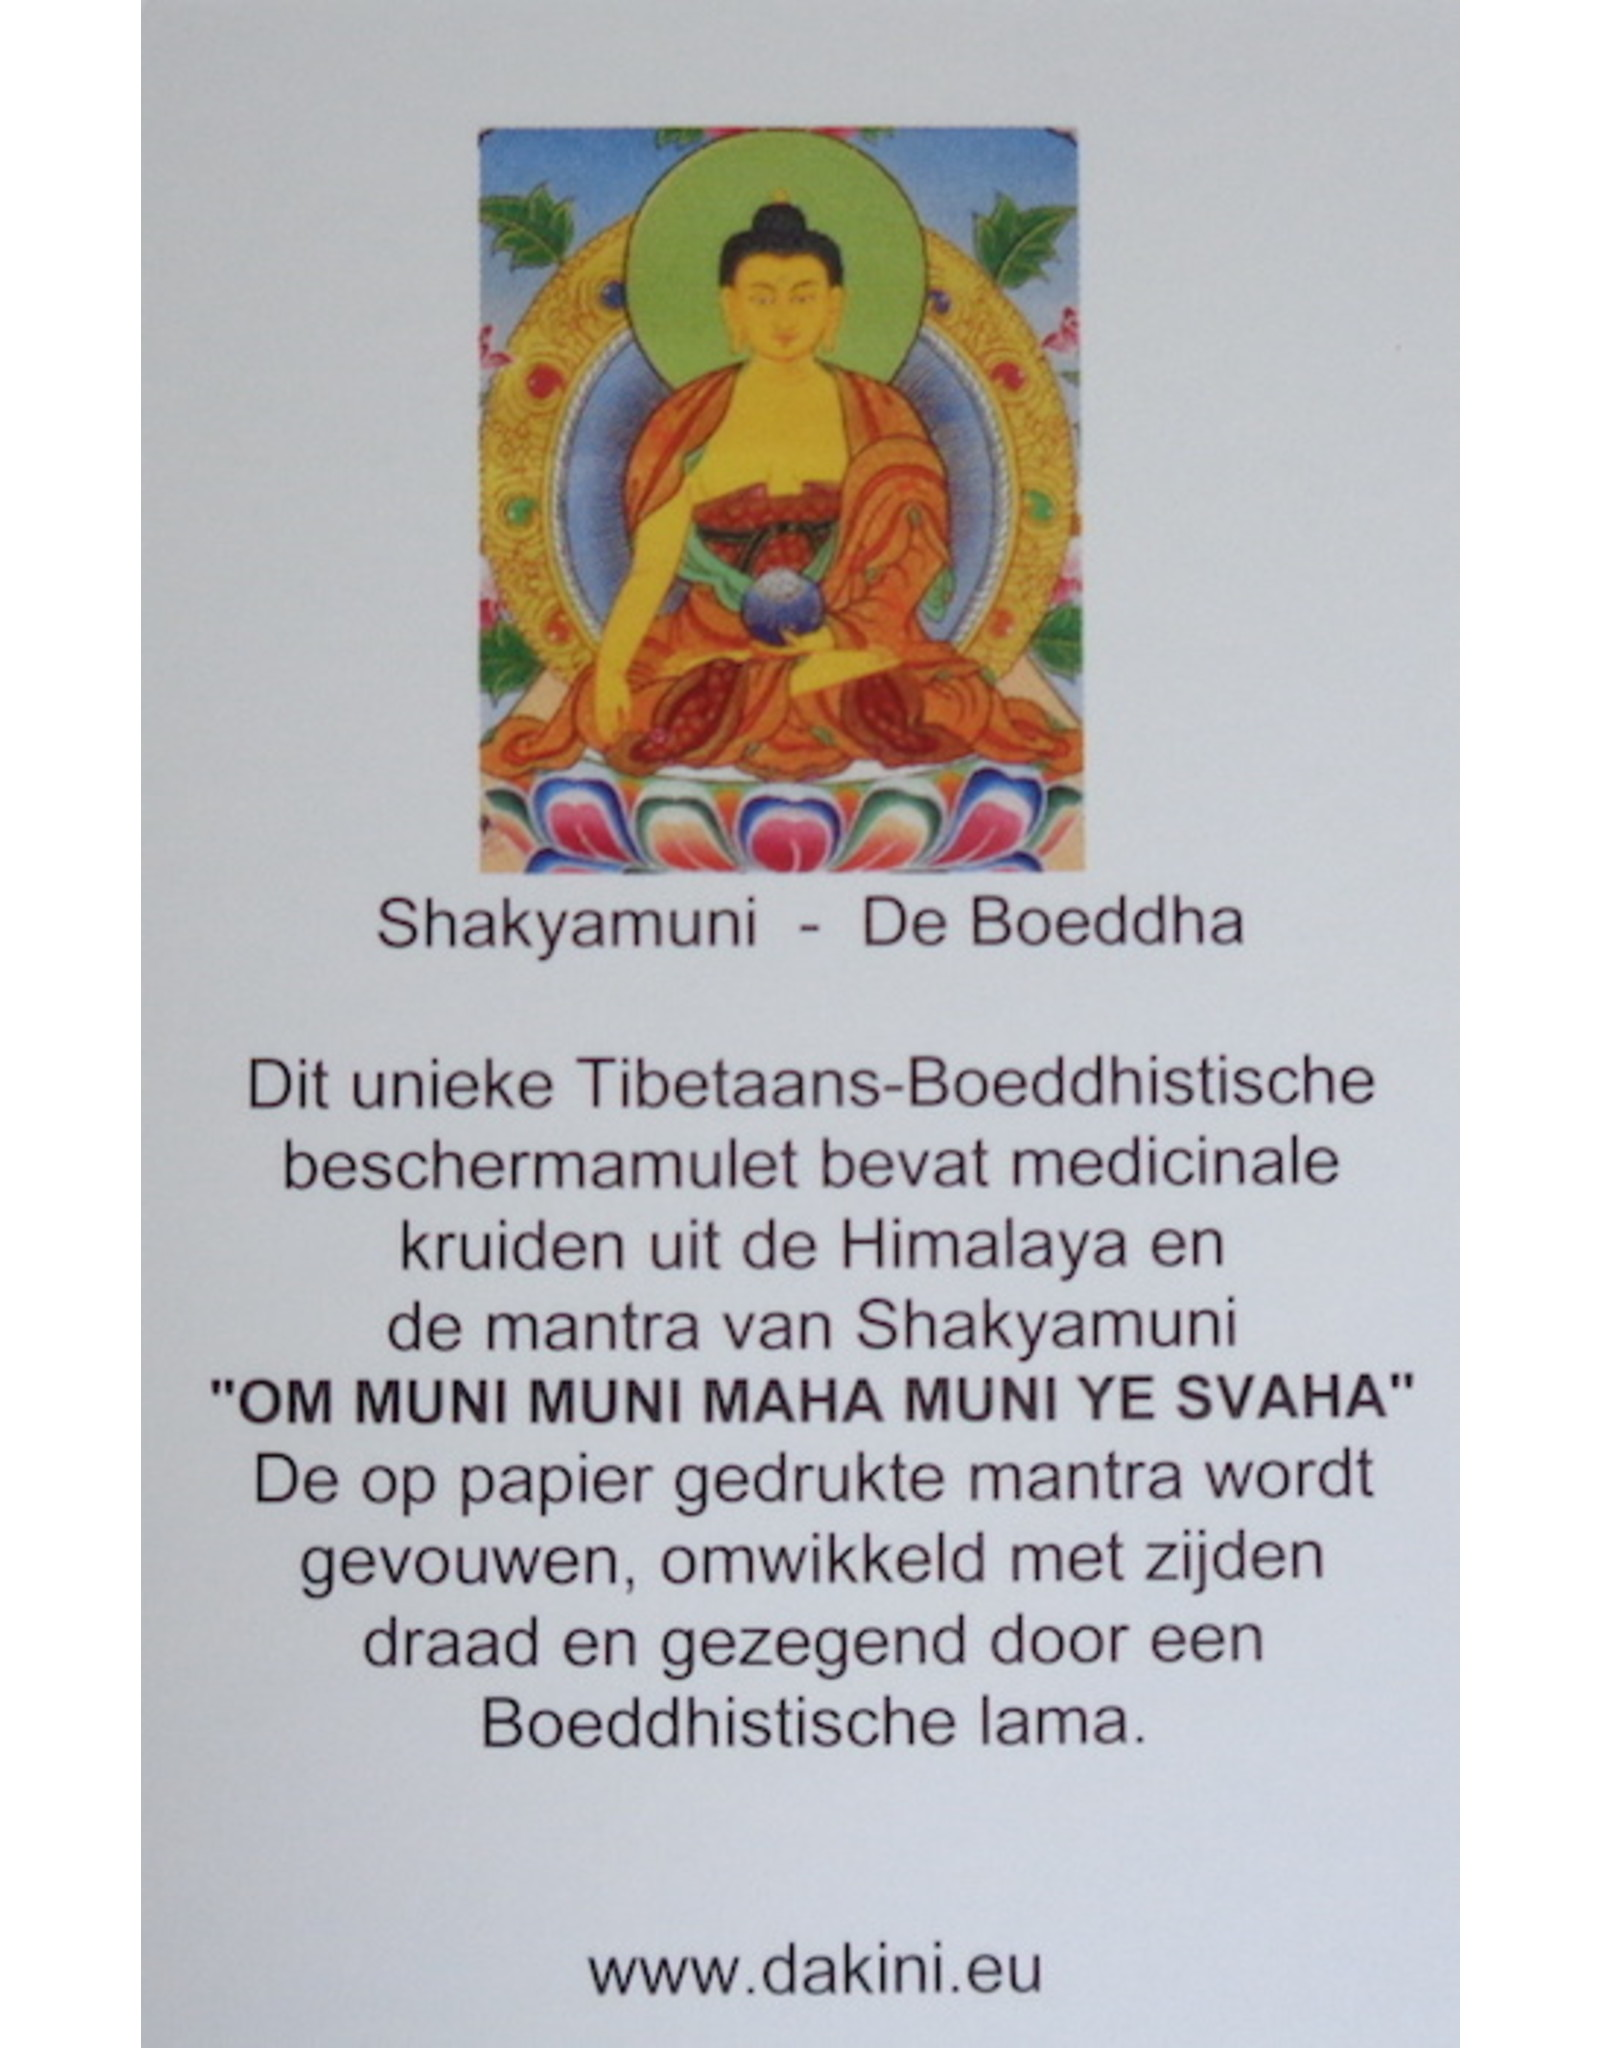 Dakini Tibetaans bescherm amulet Shakyamuni